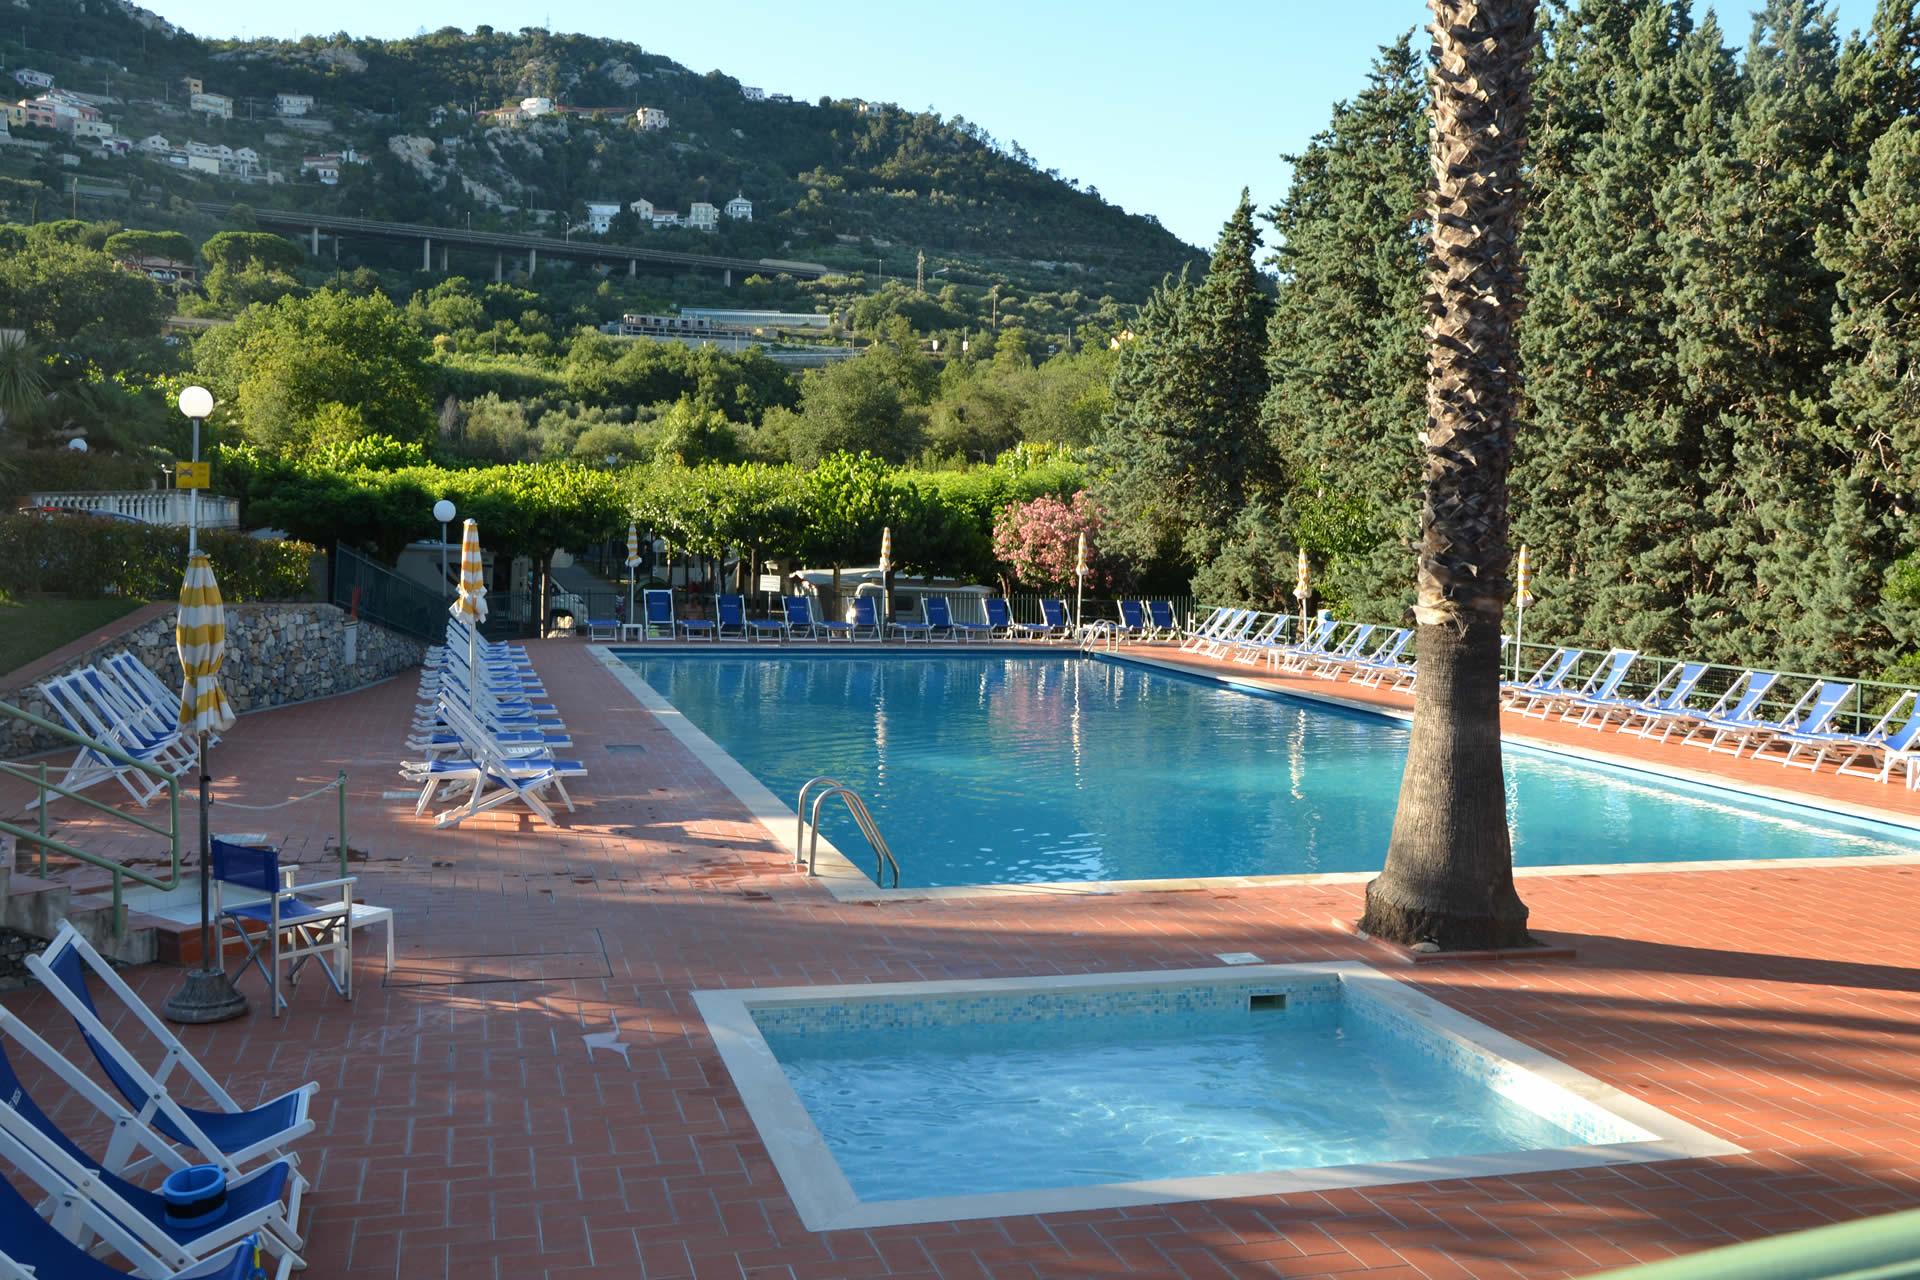 Camping villaggio vacanza piscina pietra ligure liguria for Piscine 02 peronne